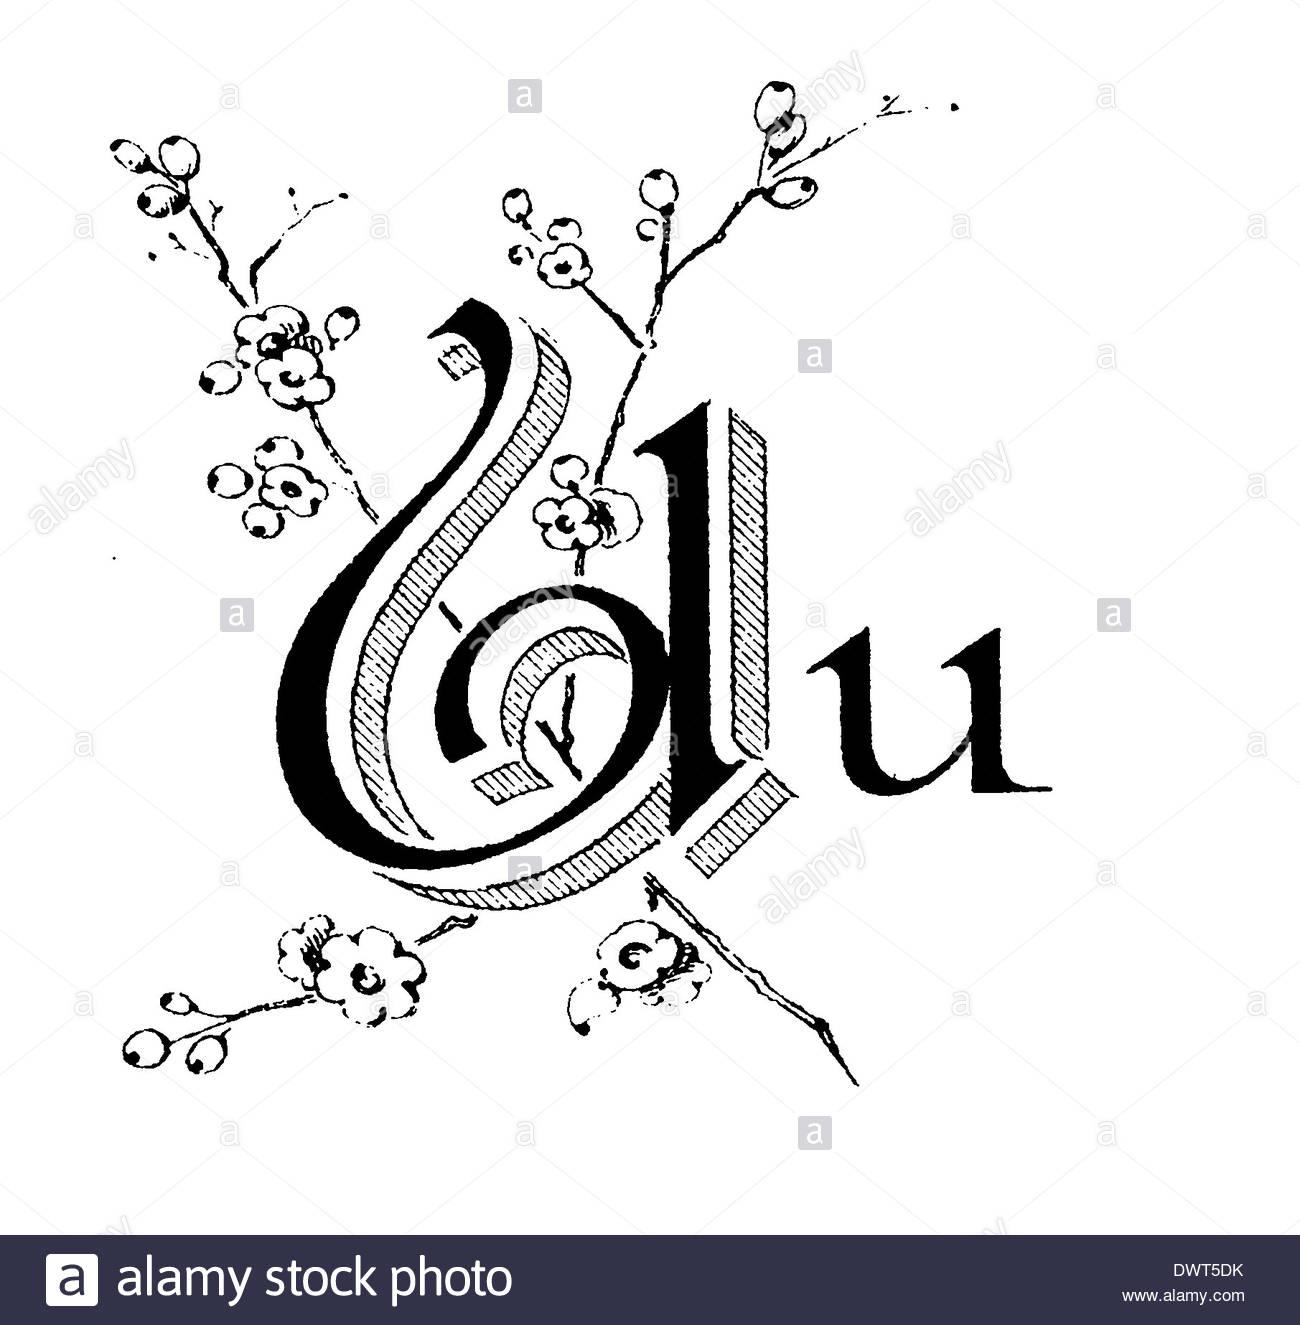 Alphabetic Character, Letter U Stock Photo, Royalty Free Image.